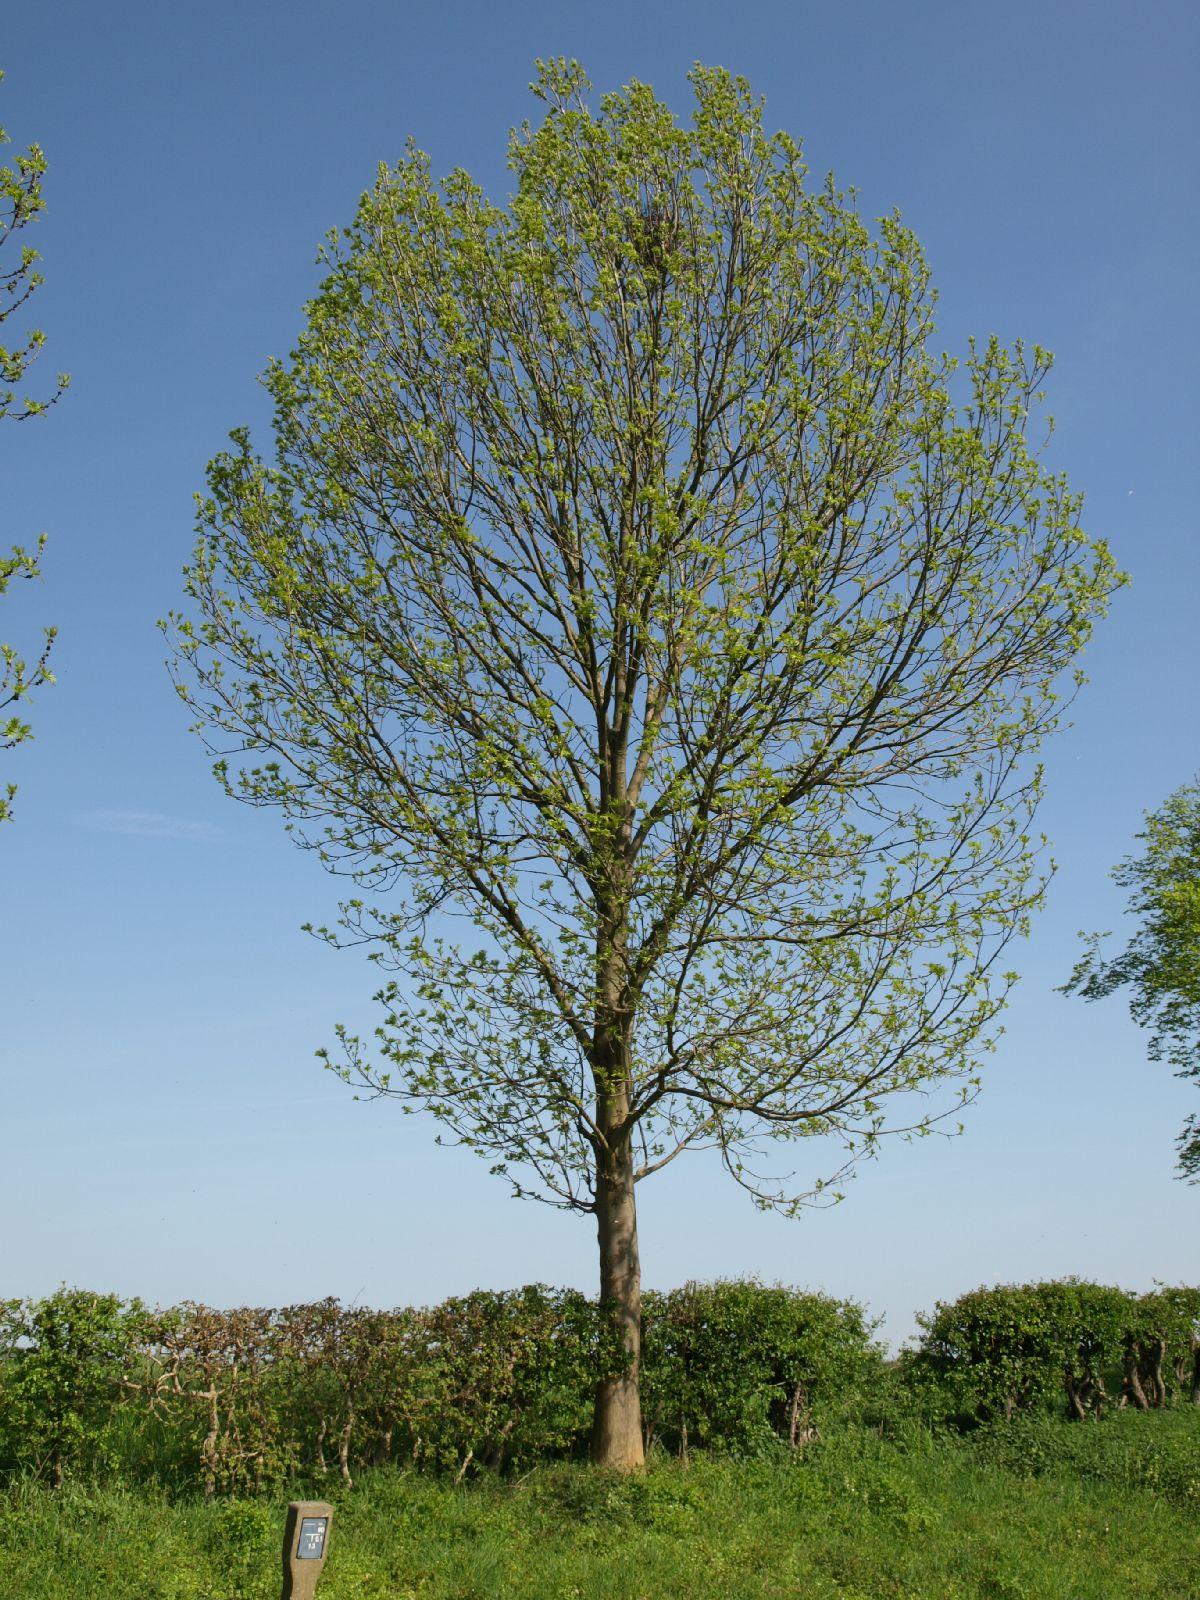 Pflanzen-Baum-Foto_Textur_B_P5042408